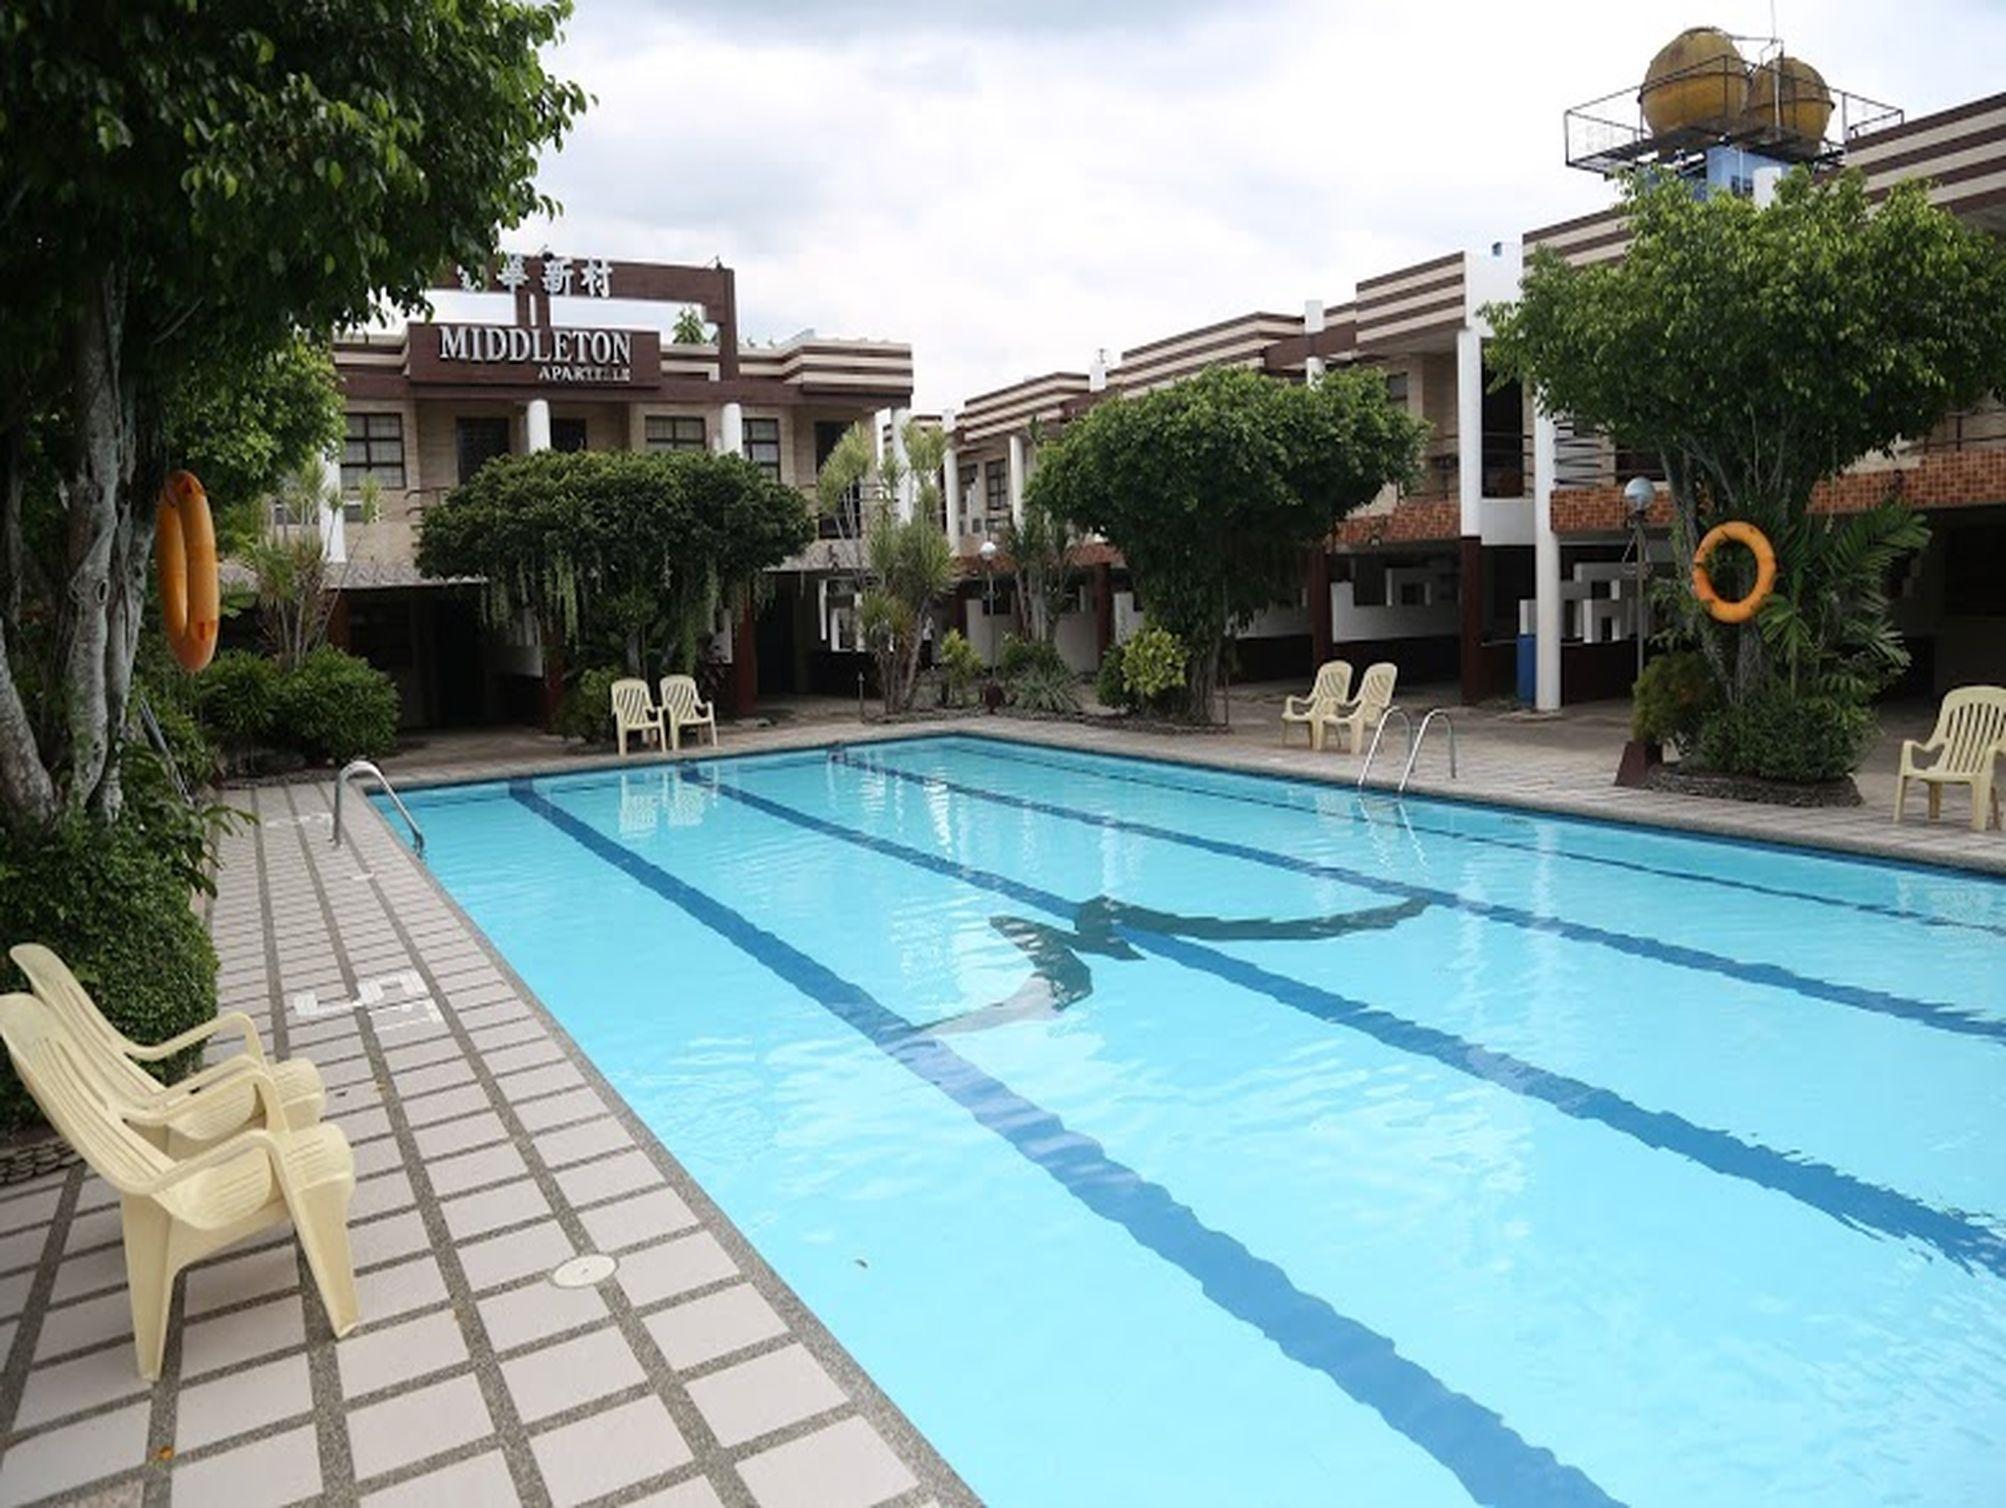 Middleton Apartelle West Cagayan De Oro Cagayan De Oro Philippines Great Discounted Rates